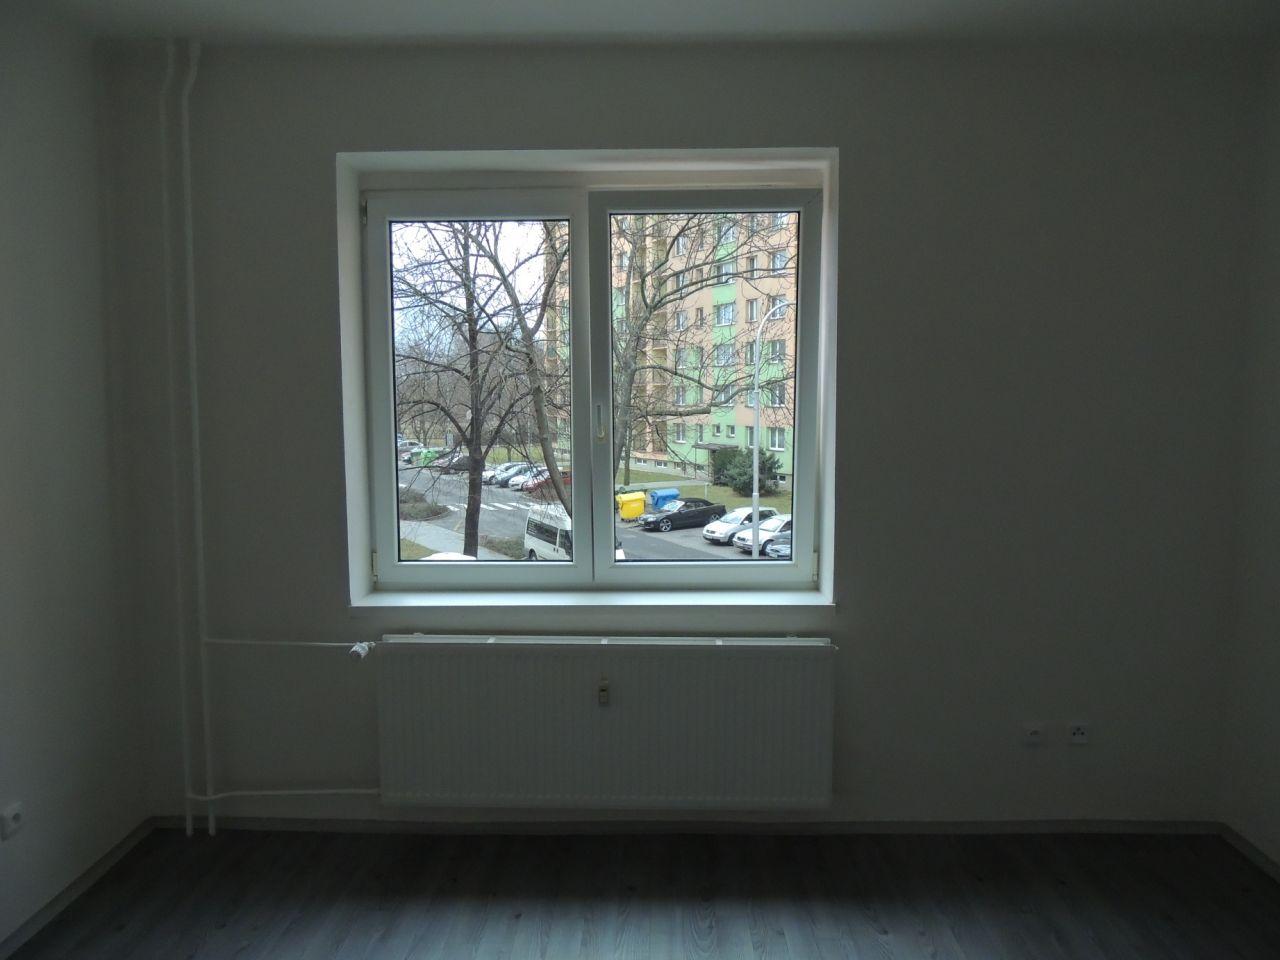 Pronájem bytu 1+1 35 m2, ul. Sládkova 872/23, Ostrava - Fifejdy